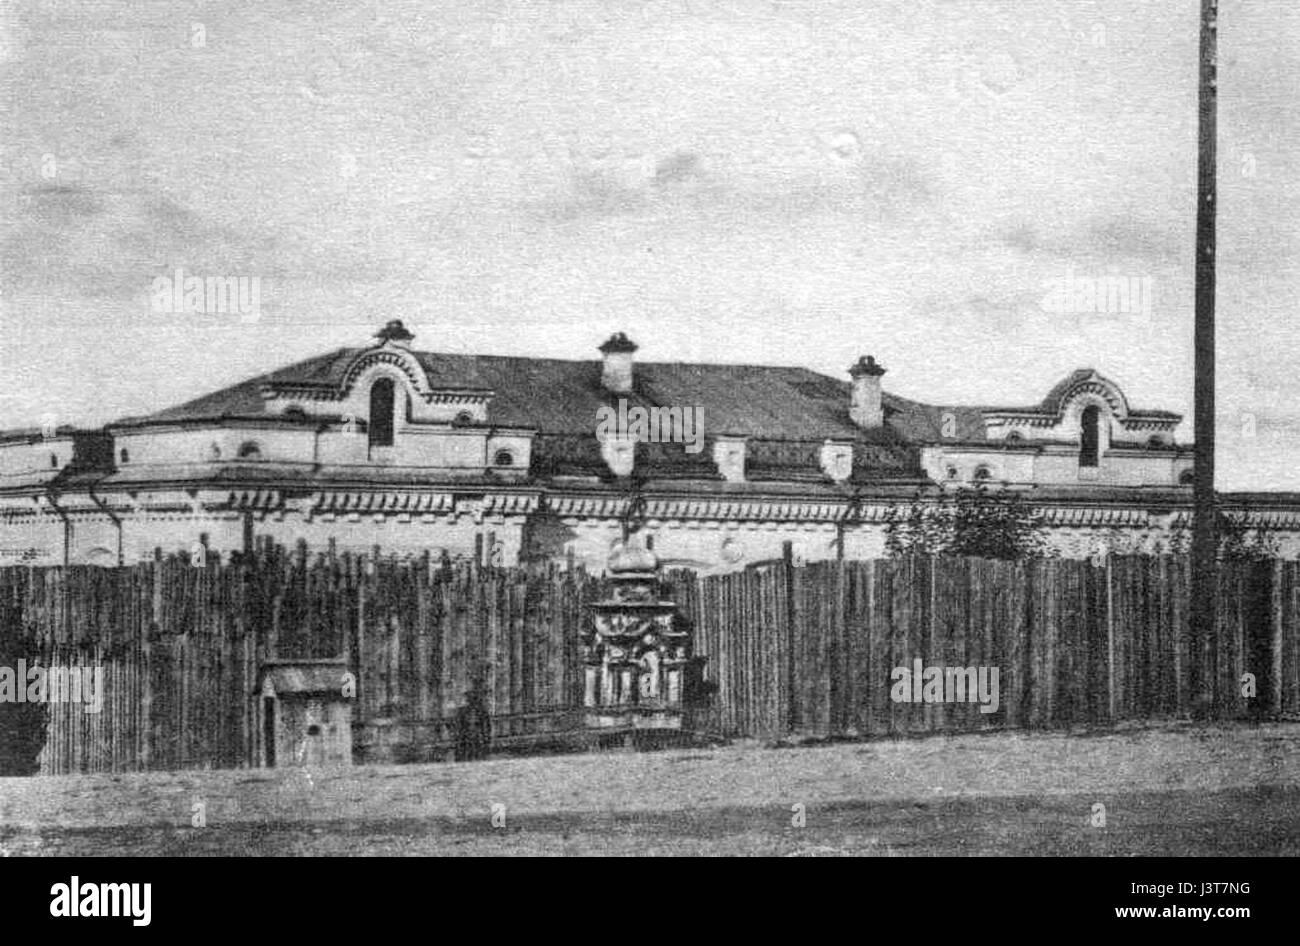 Ipatjew-Haus im Jahre 1918 Stockfoto, Bild: 140059852 - Alamy